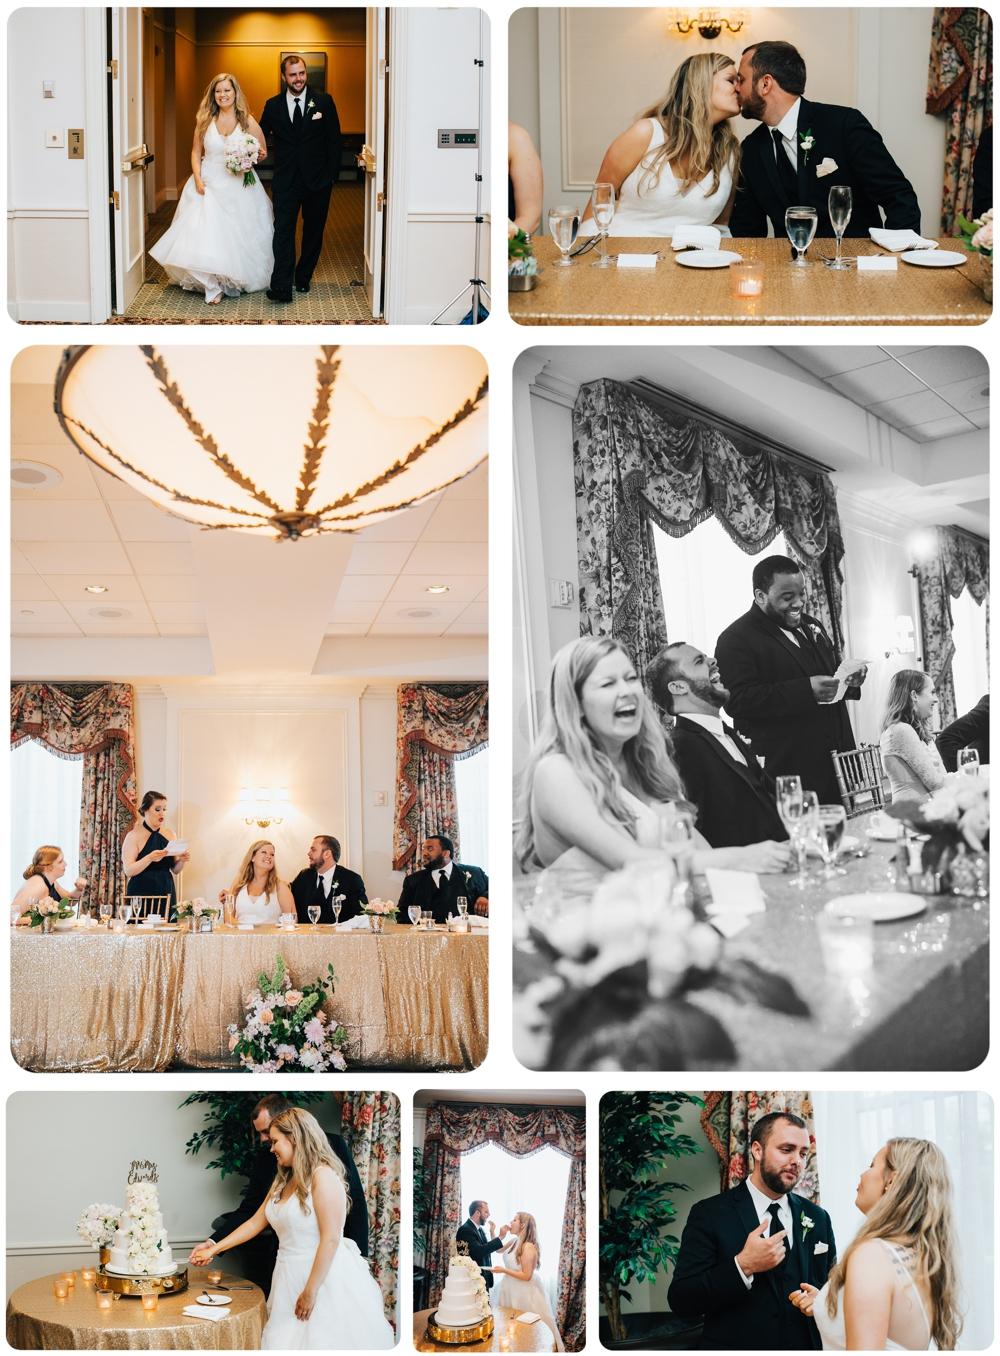 Margaret-Jon-Collage-10.jpg